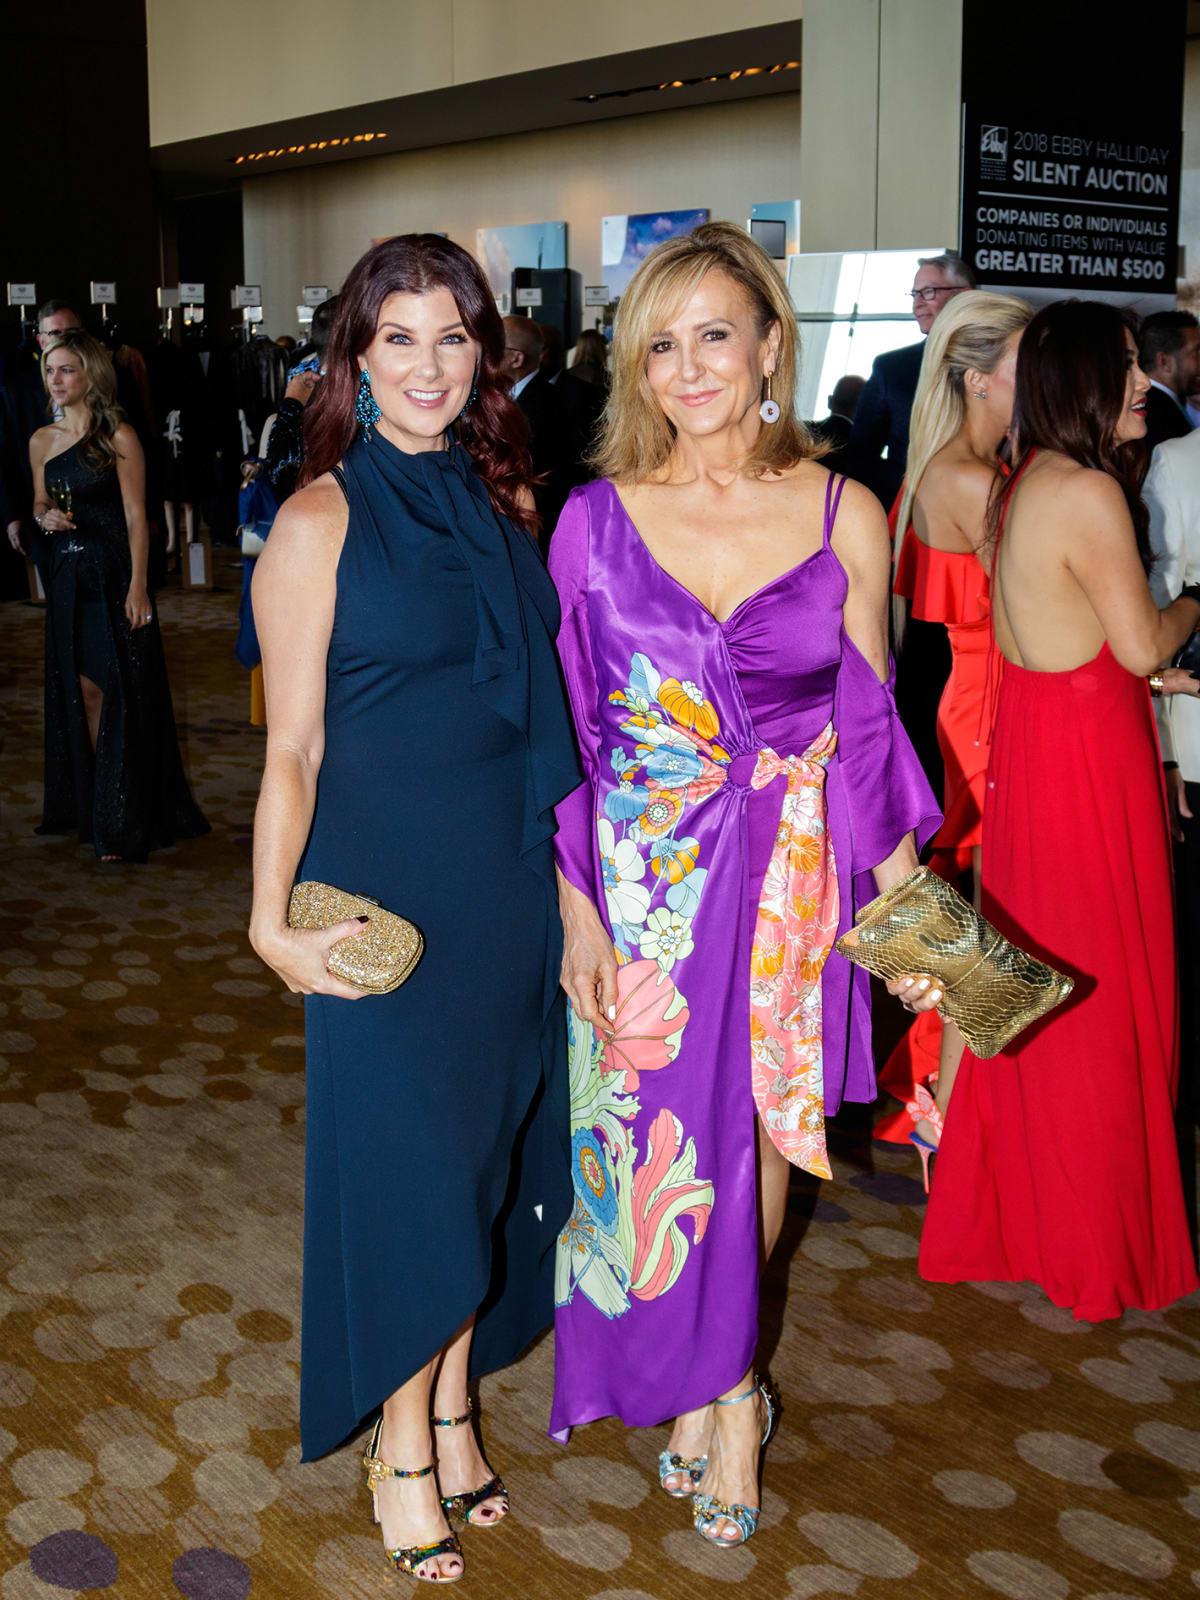 Cynthia Smoot, Jane McGarry at House of DIFFA 2018